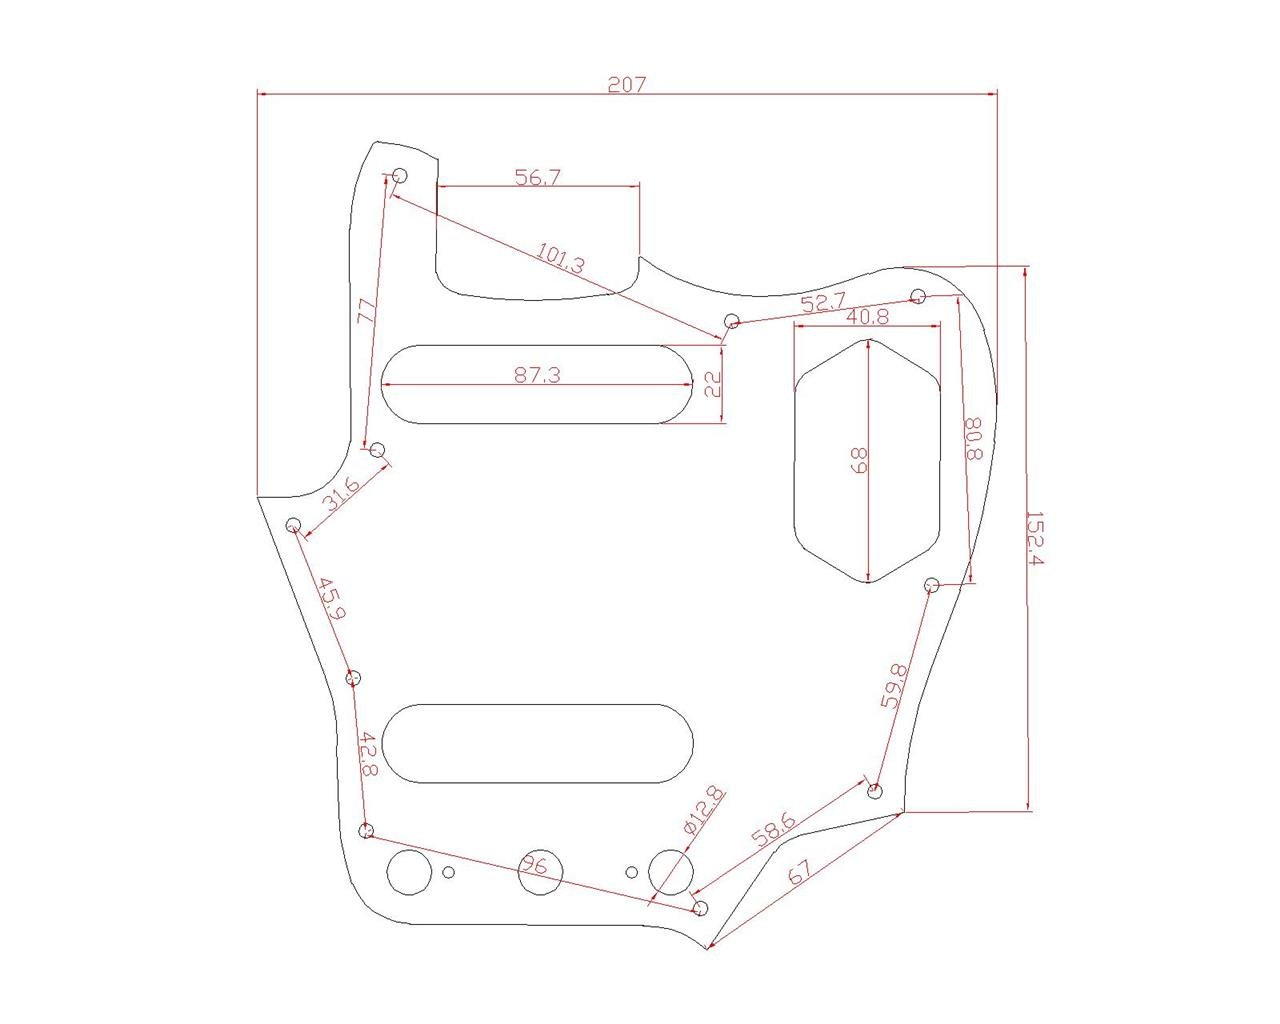 MaxTool 3//4-10P HAND THREAD TAP; PLUG HSS M2; FULLY GROUND RIGHT HAND; HPF02W00R048